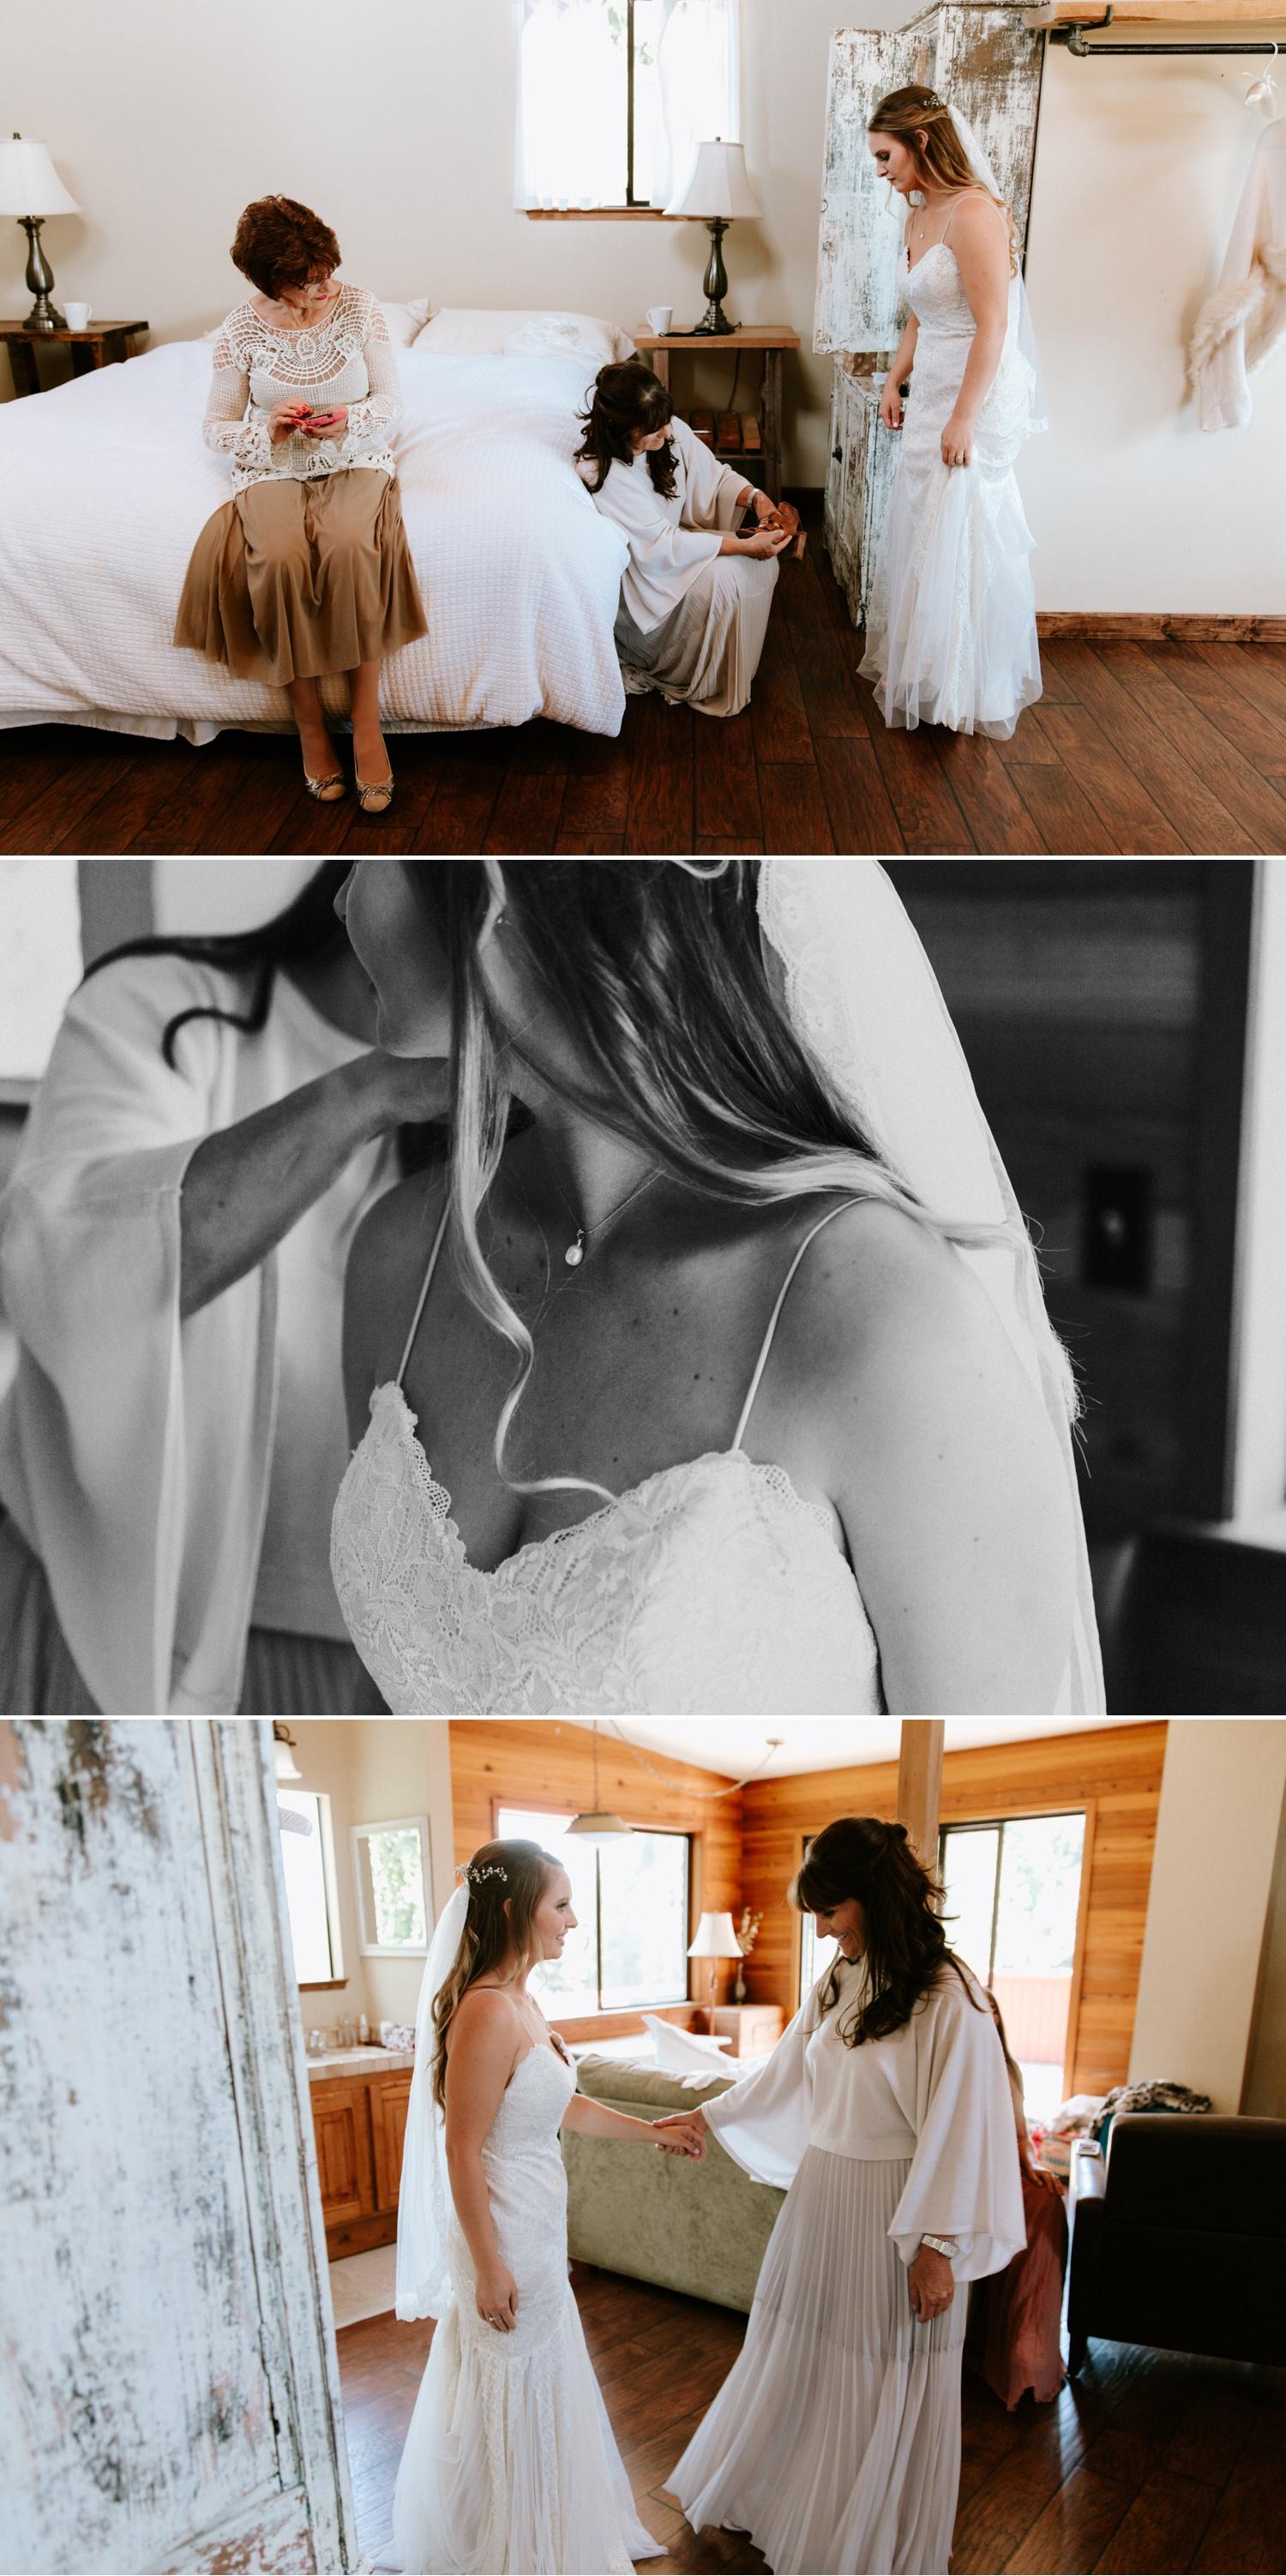 Intimate wedding in Santa Cruz by Paige Nelson